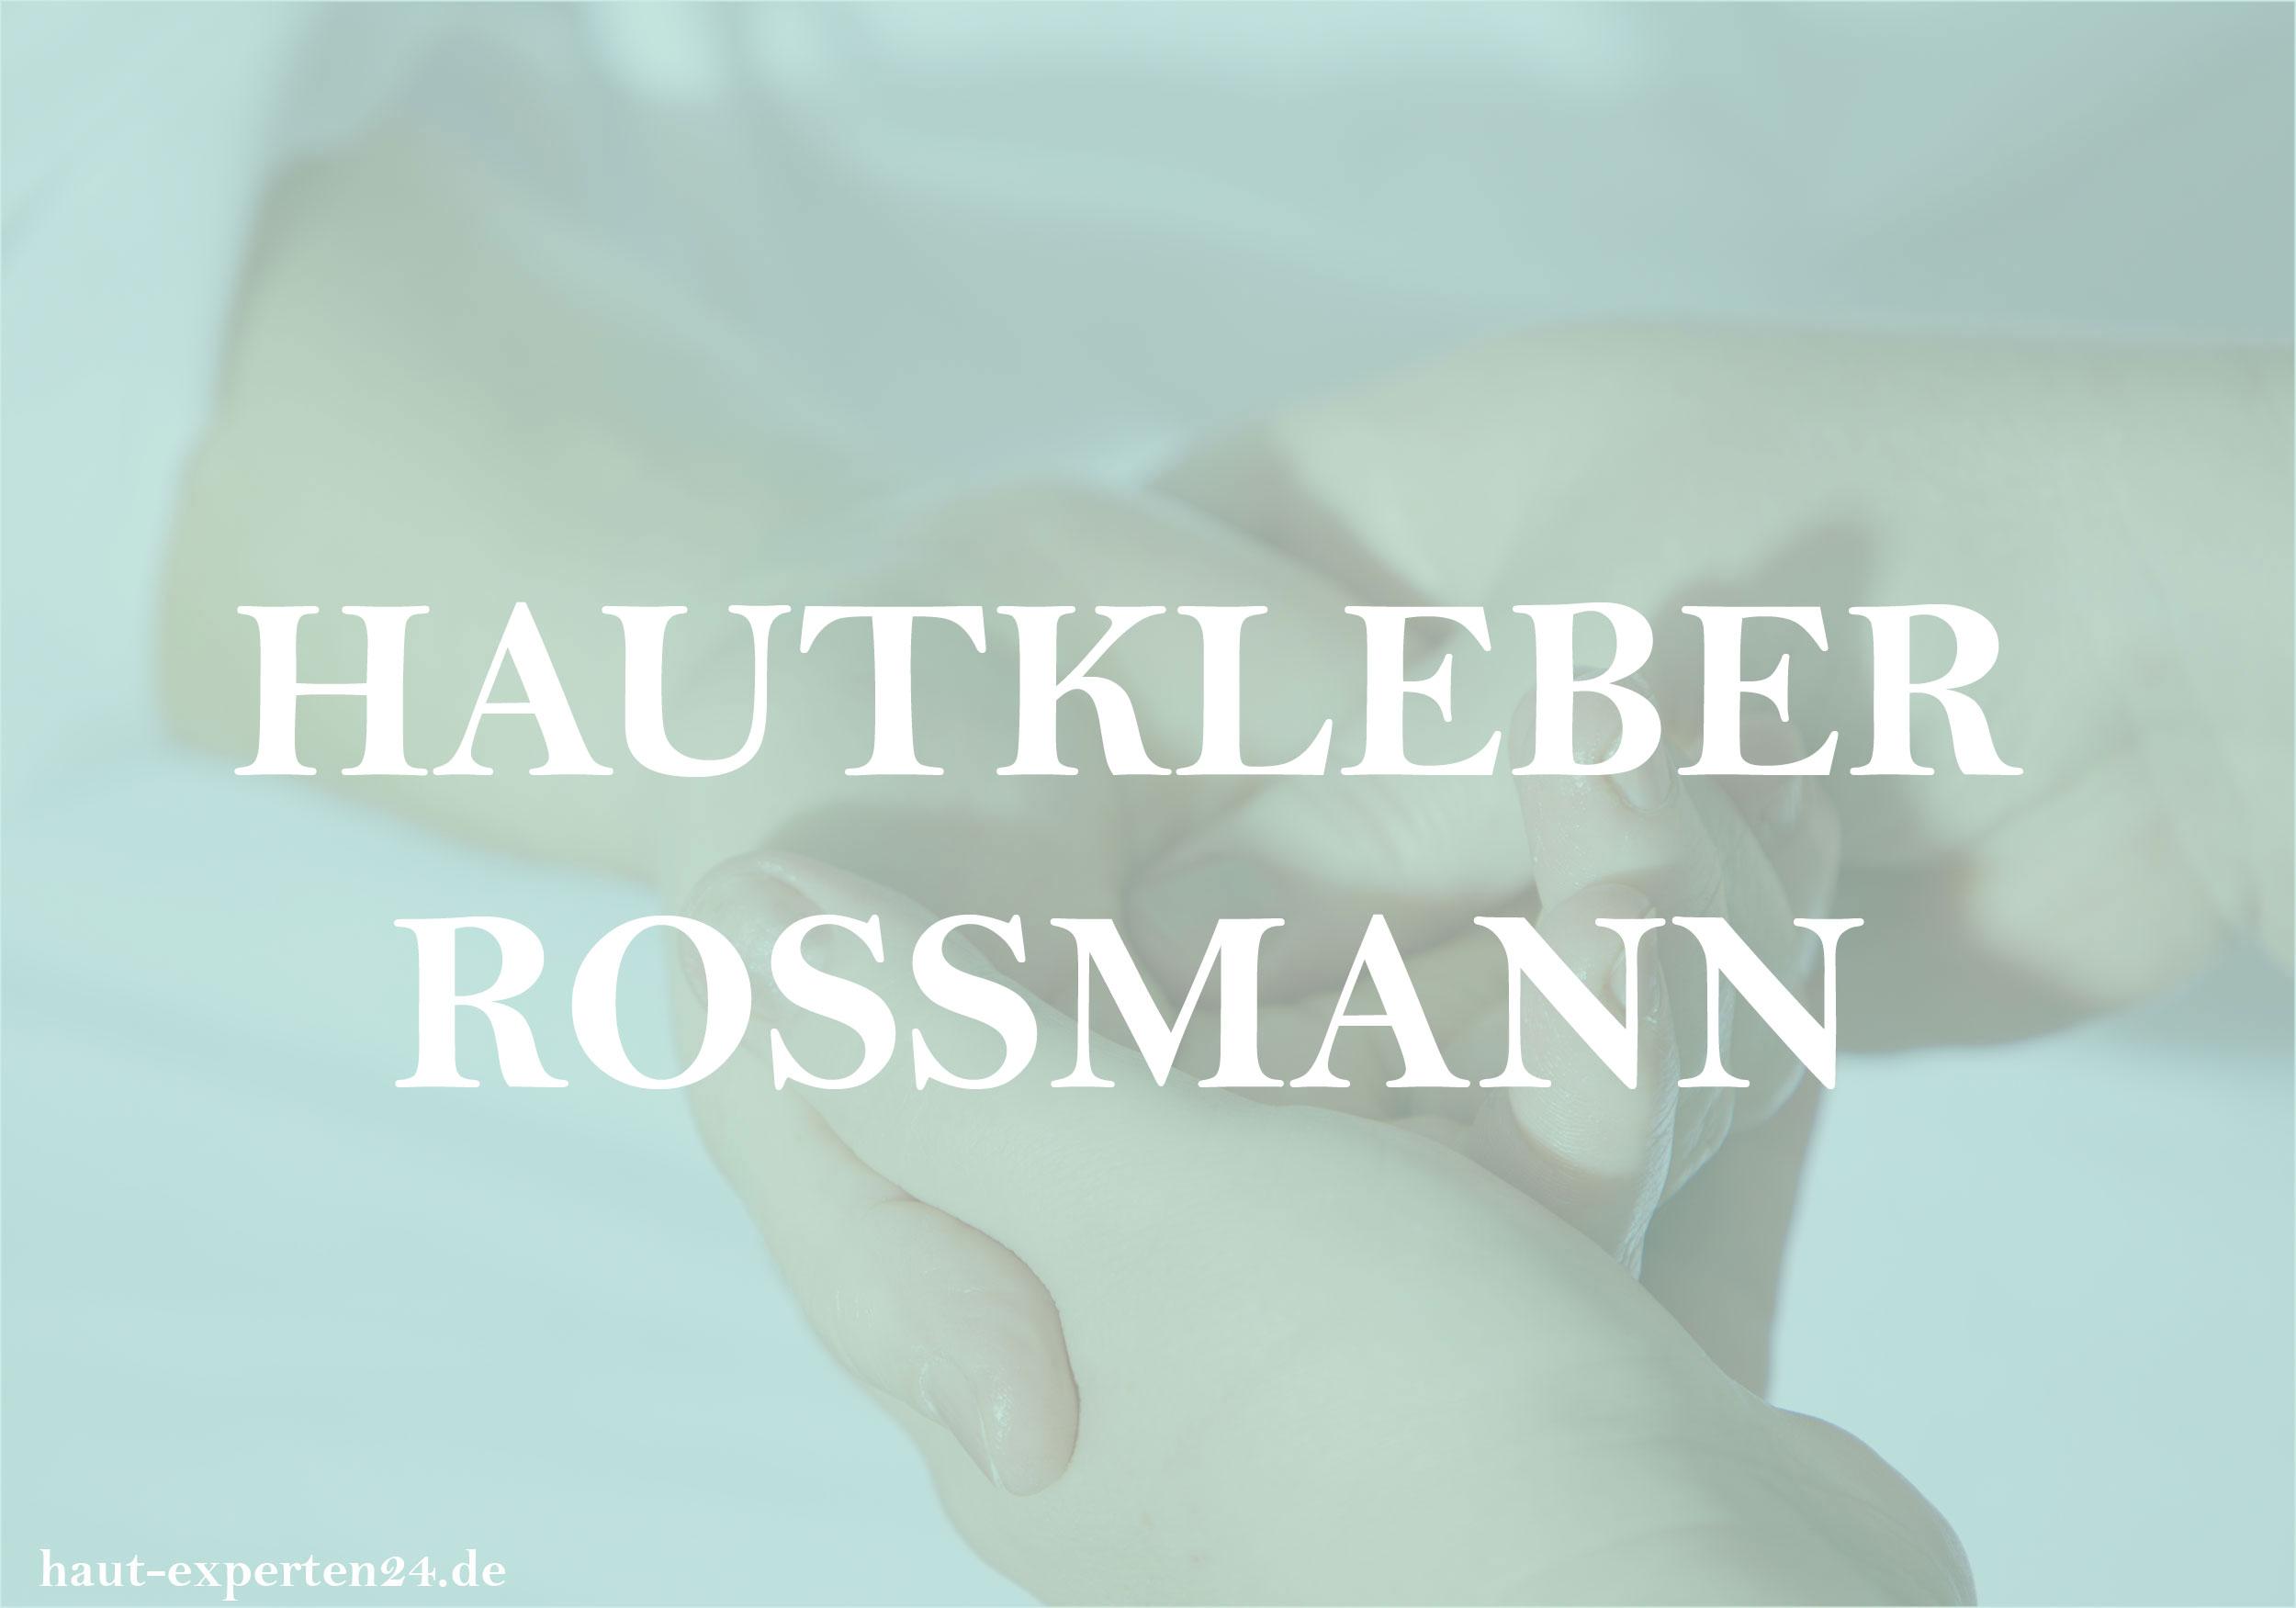 Hautkleber Rossmann - Kostümdesign nun auch aus der Drogerie?